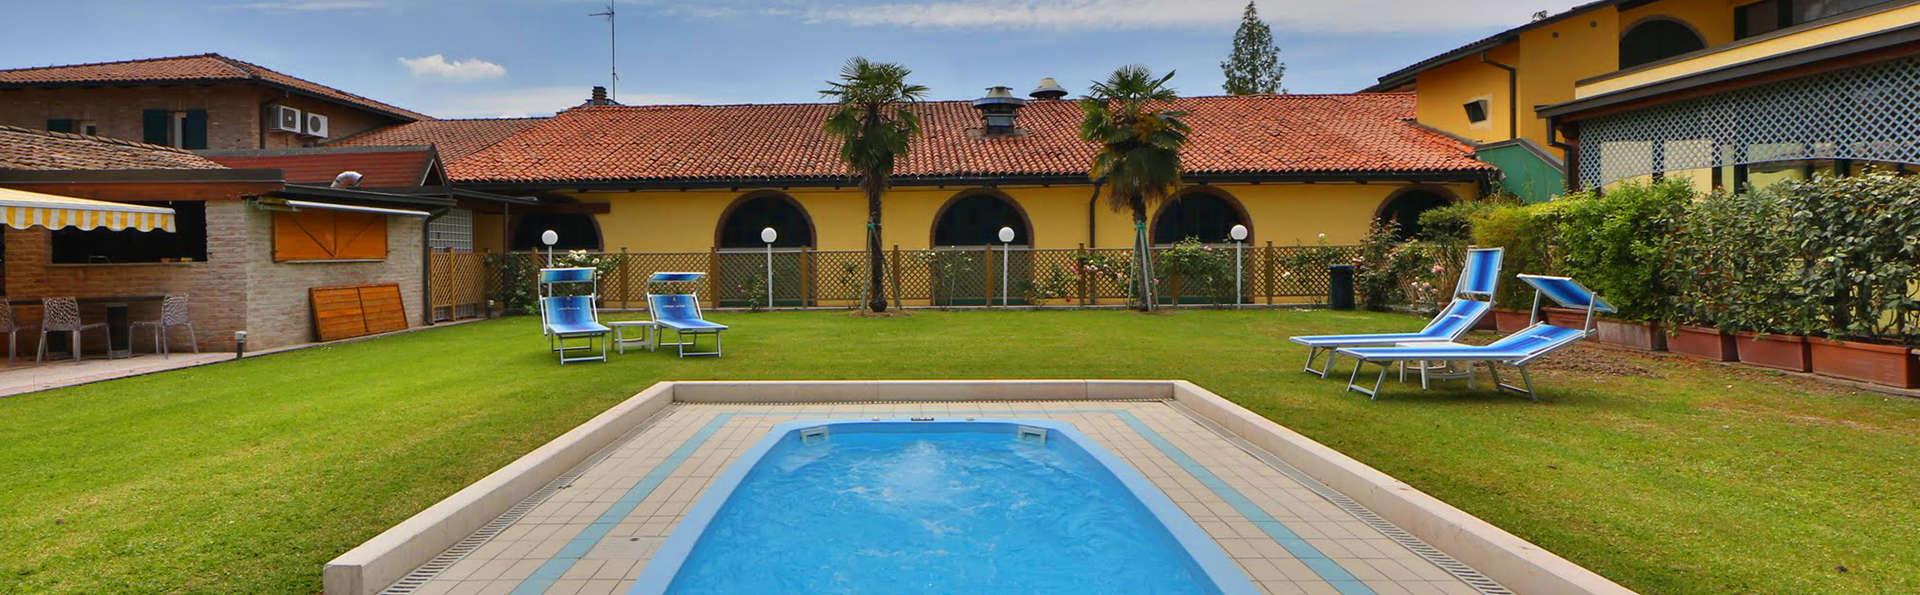 Best Western Plus Modena Resort - edit_swimmingpool2.jpg